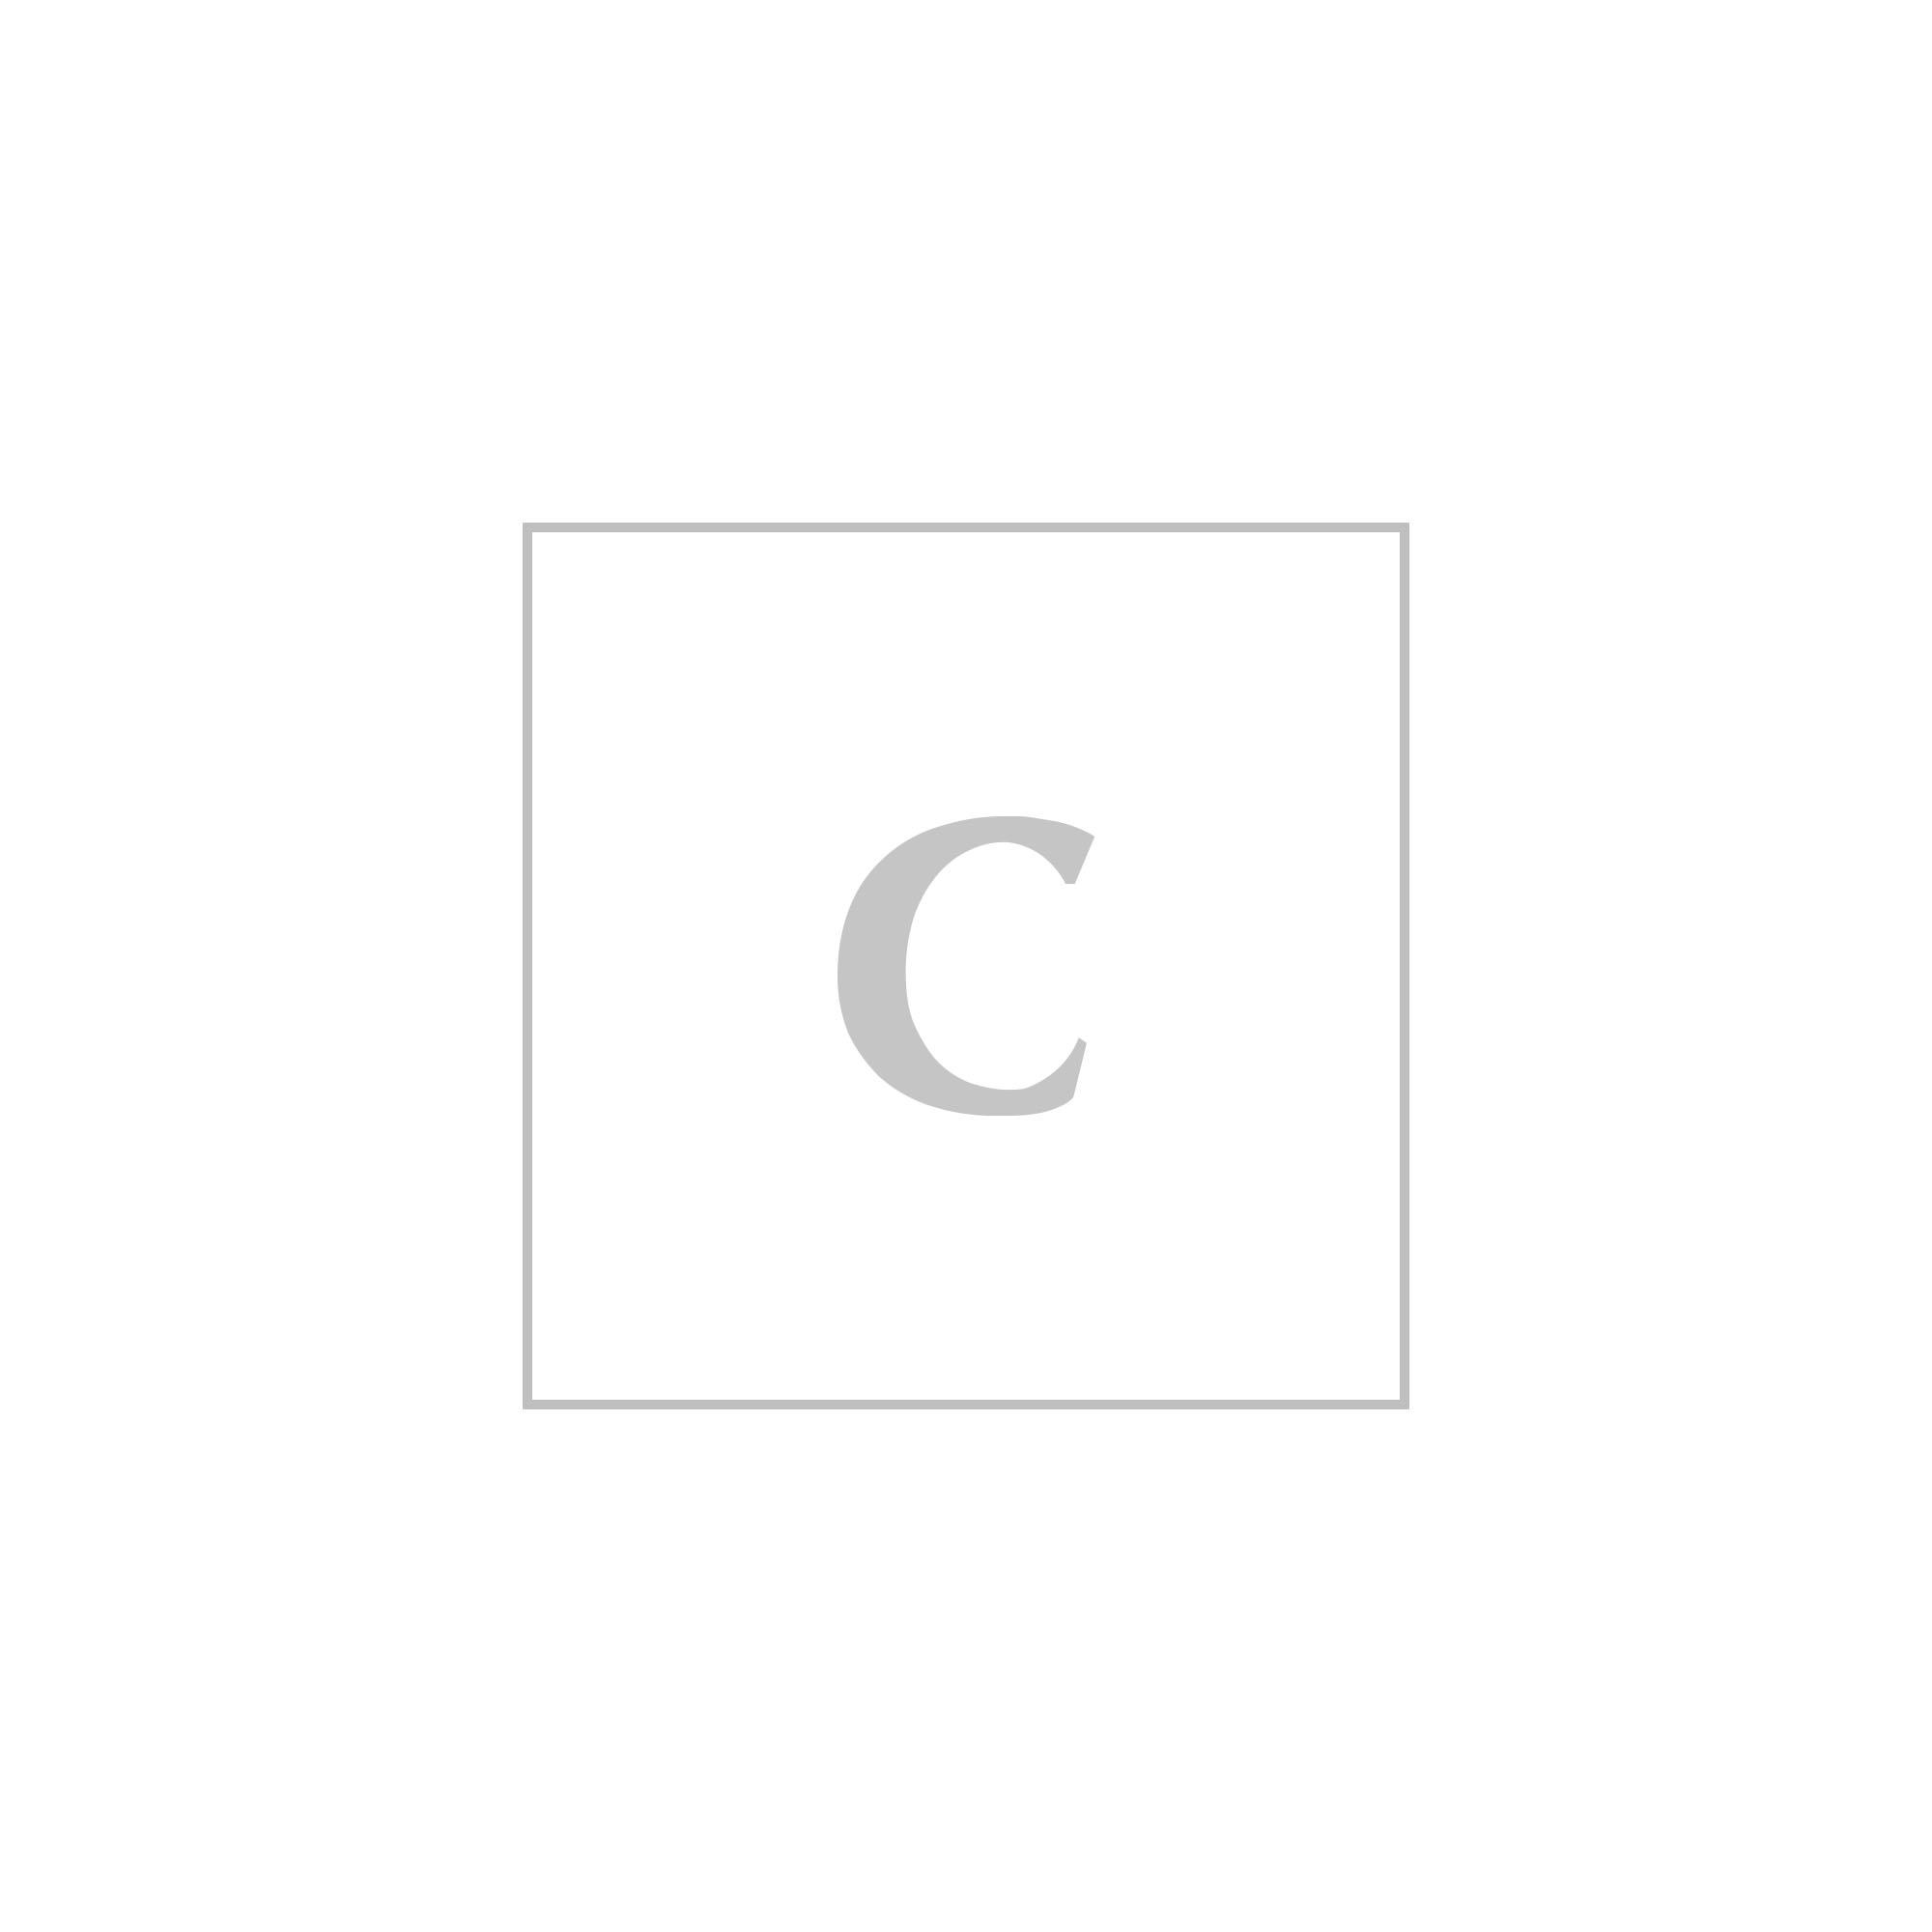 Saint laurent ysl pochette monogramme